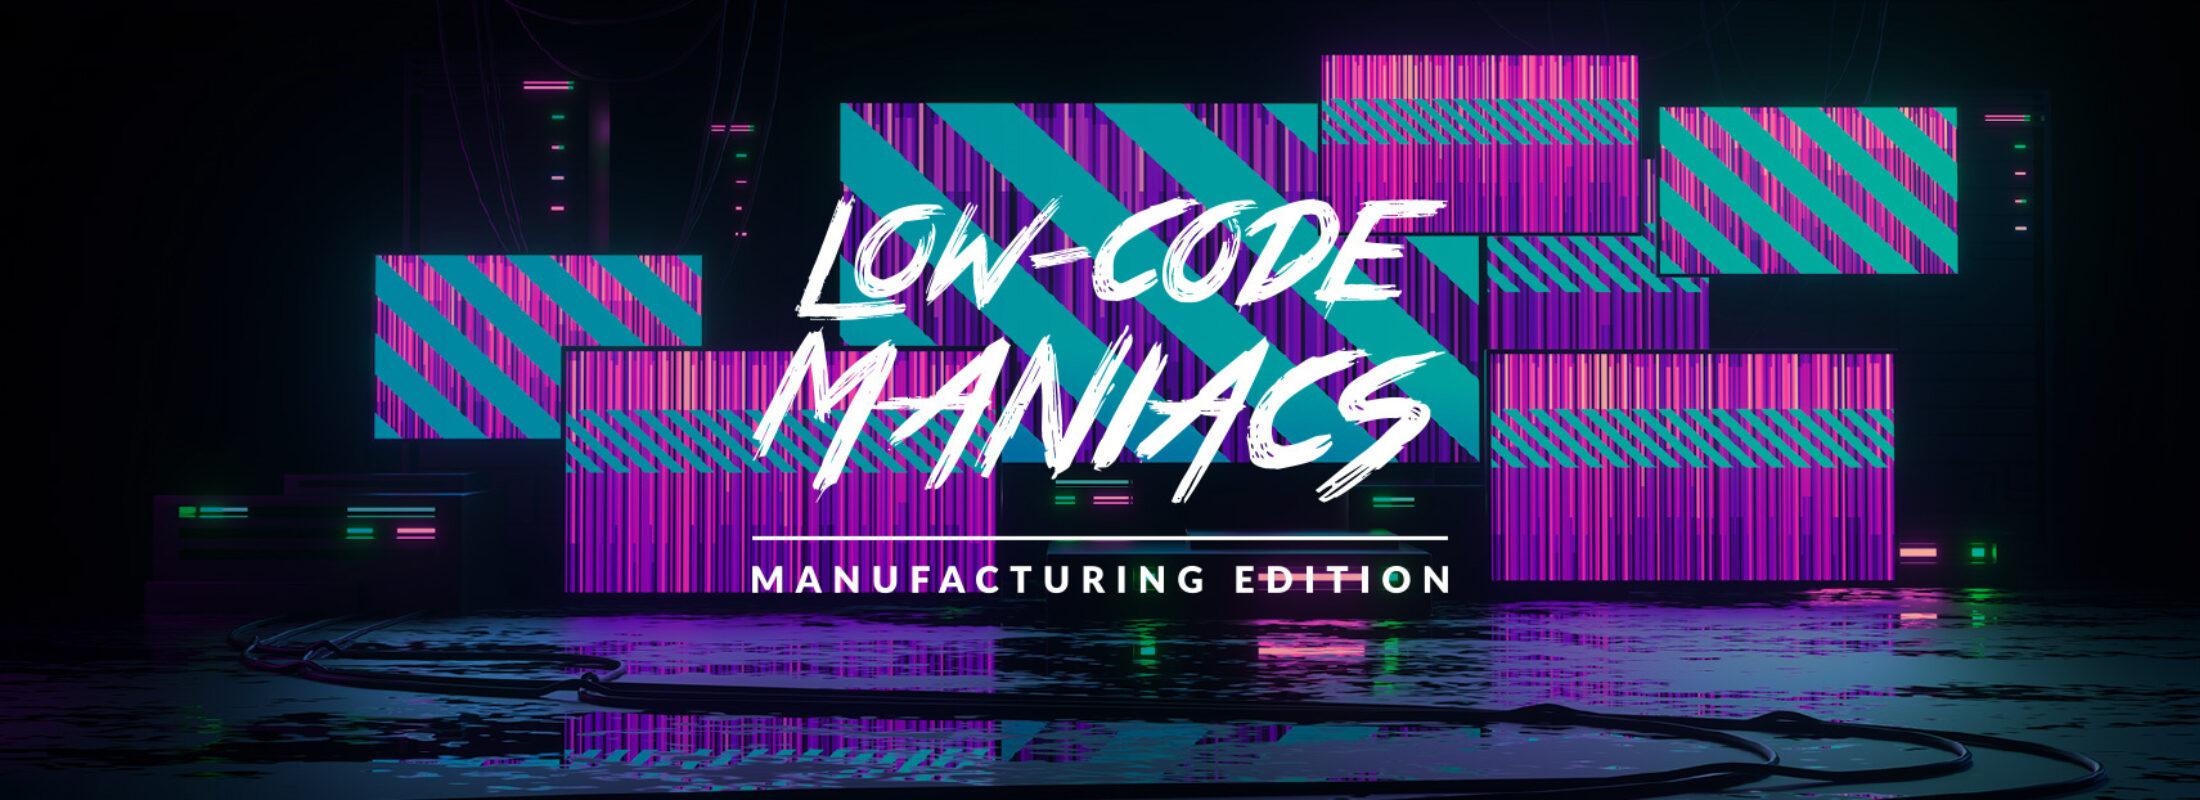 Manufacturing hero imagejpg